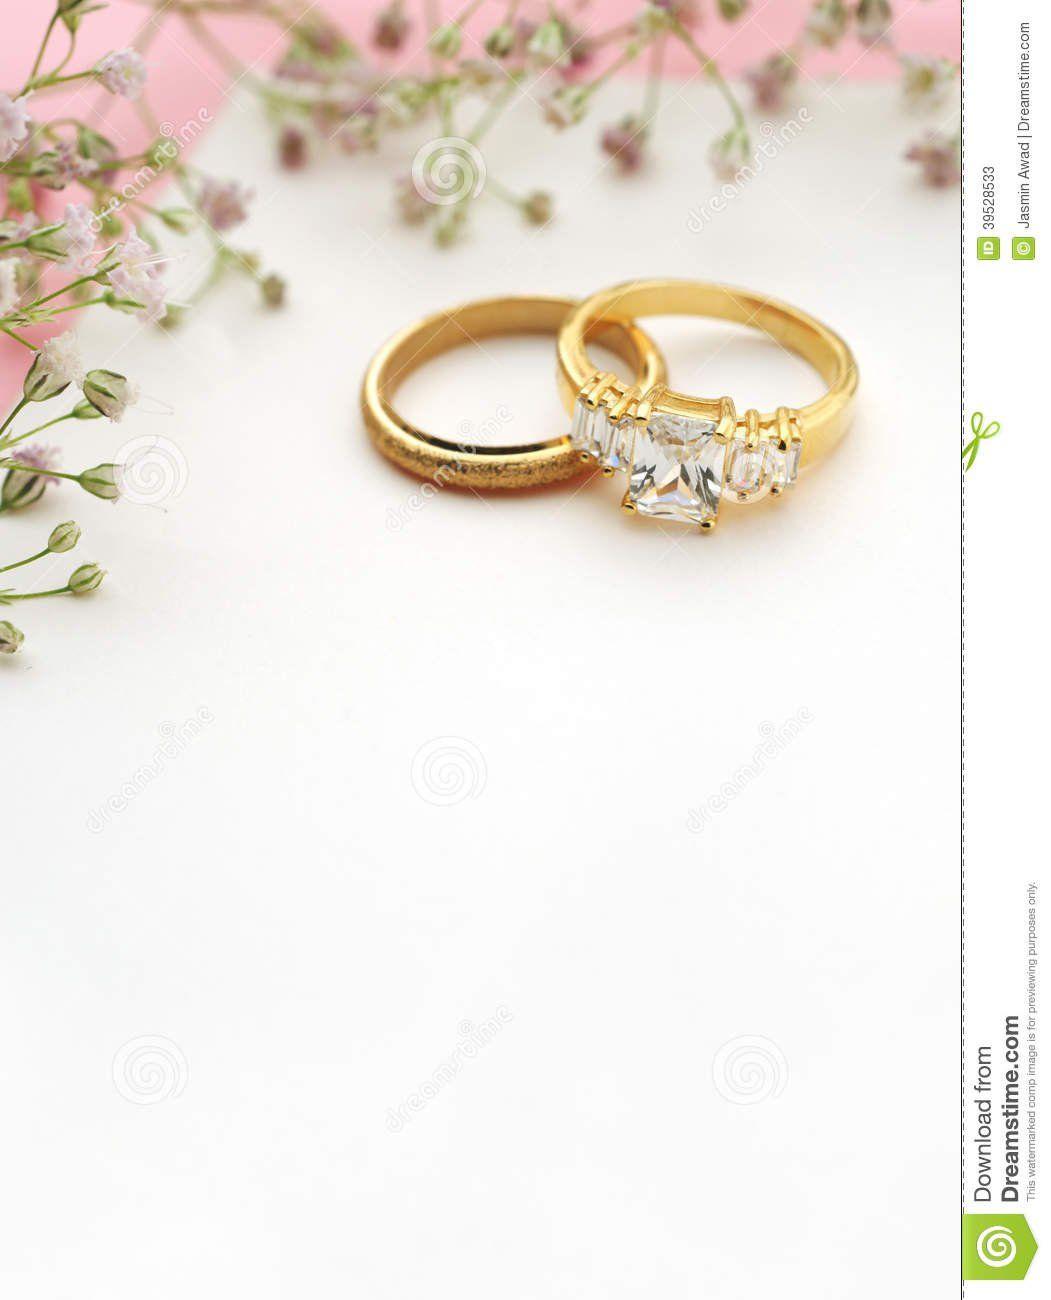 Blank Wedding Invitation Templates Hd Luxury Blank Engagement Inv Engagement Invitation Template Engagement Invitation Cards Blank Wedding Invitation Templates